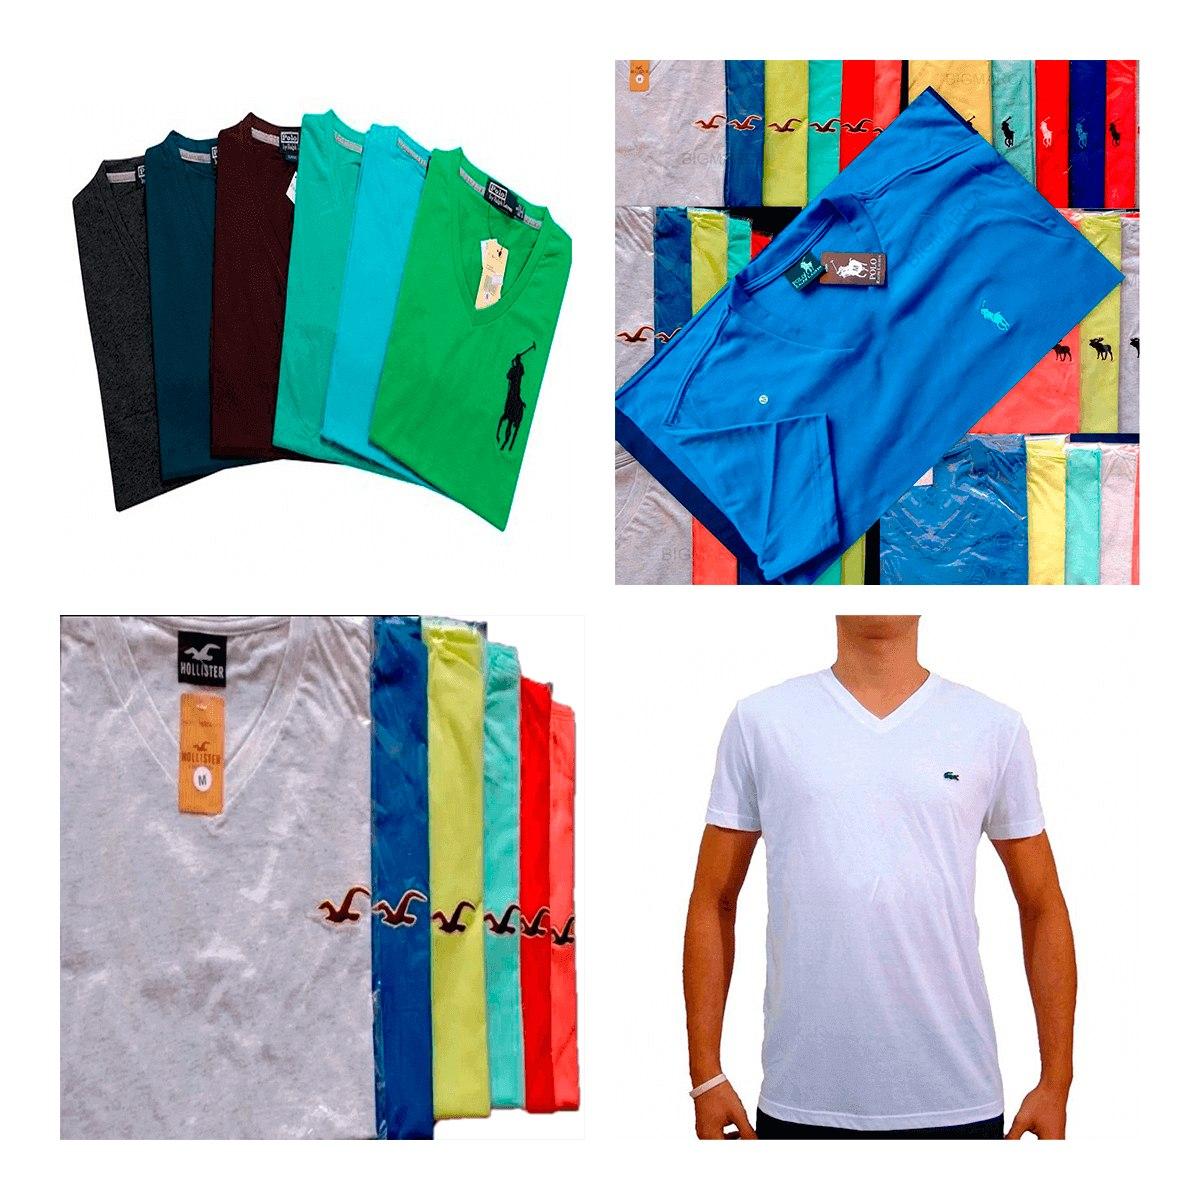 Kit 20 Camisa Camiseta Masculina De Marca Gola V Top - R  187 82ae54f1f1d31